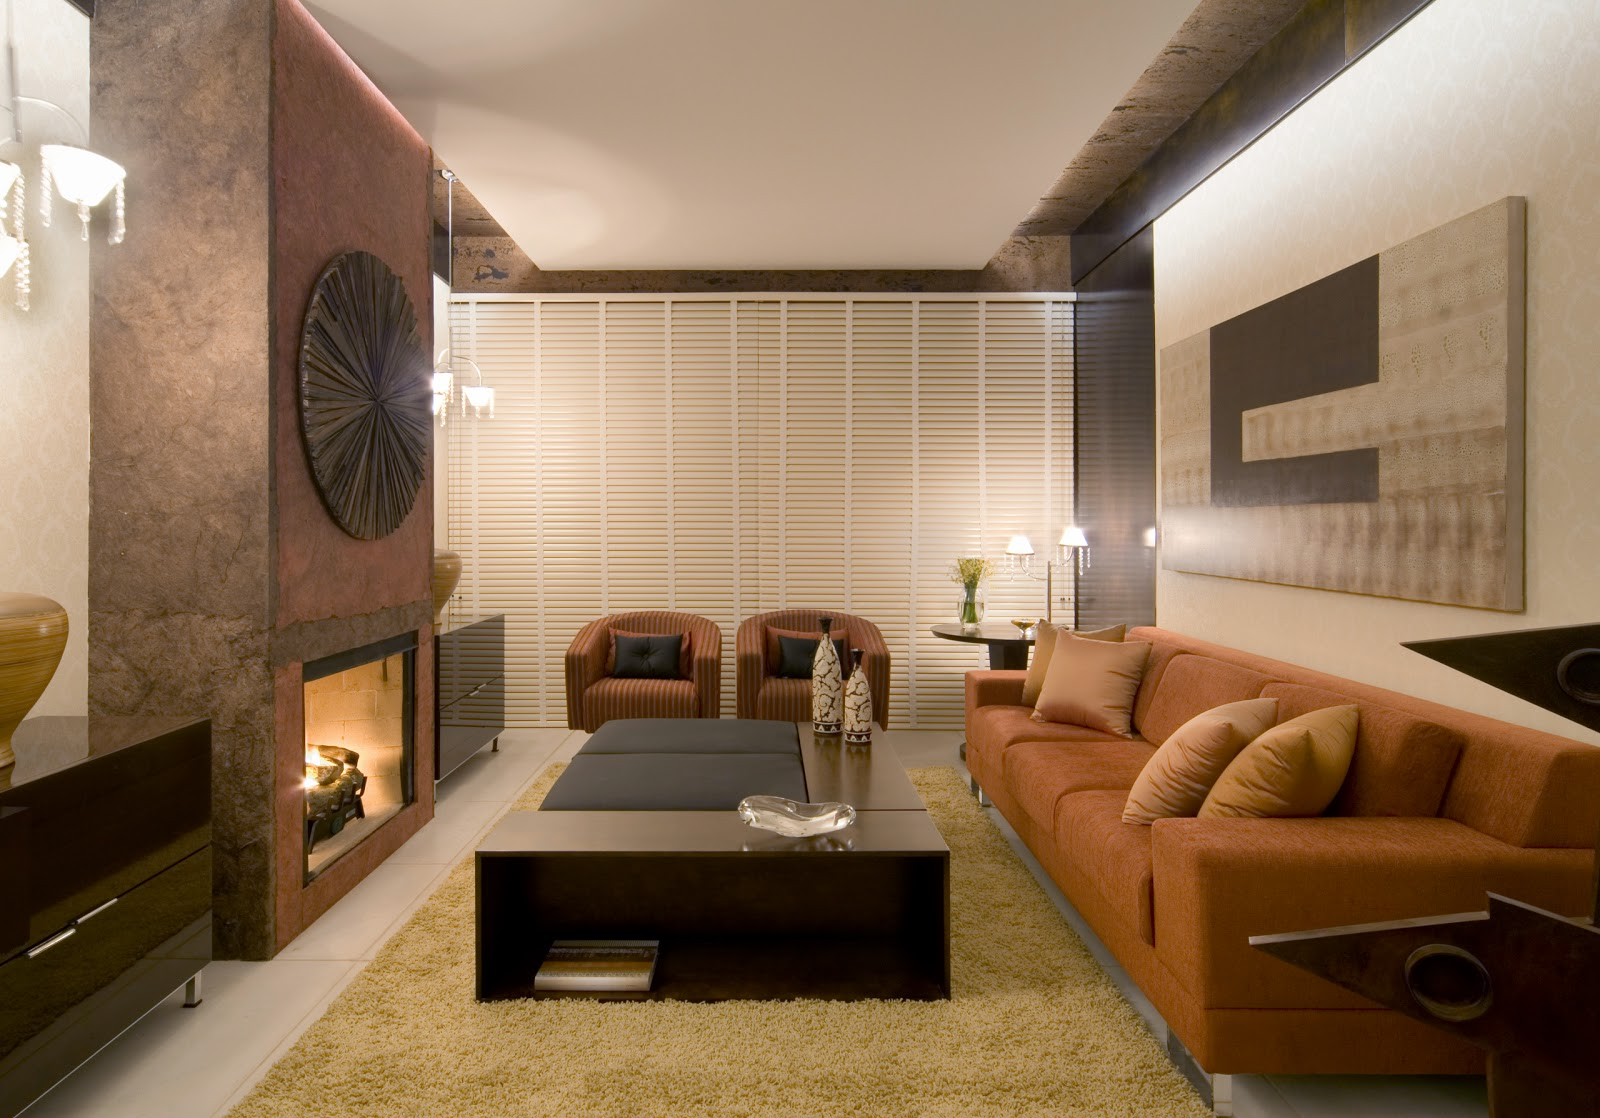 Feng shui e decora o ambientes casa cor for Decoraciones de ambientes de casas